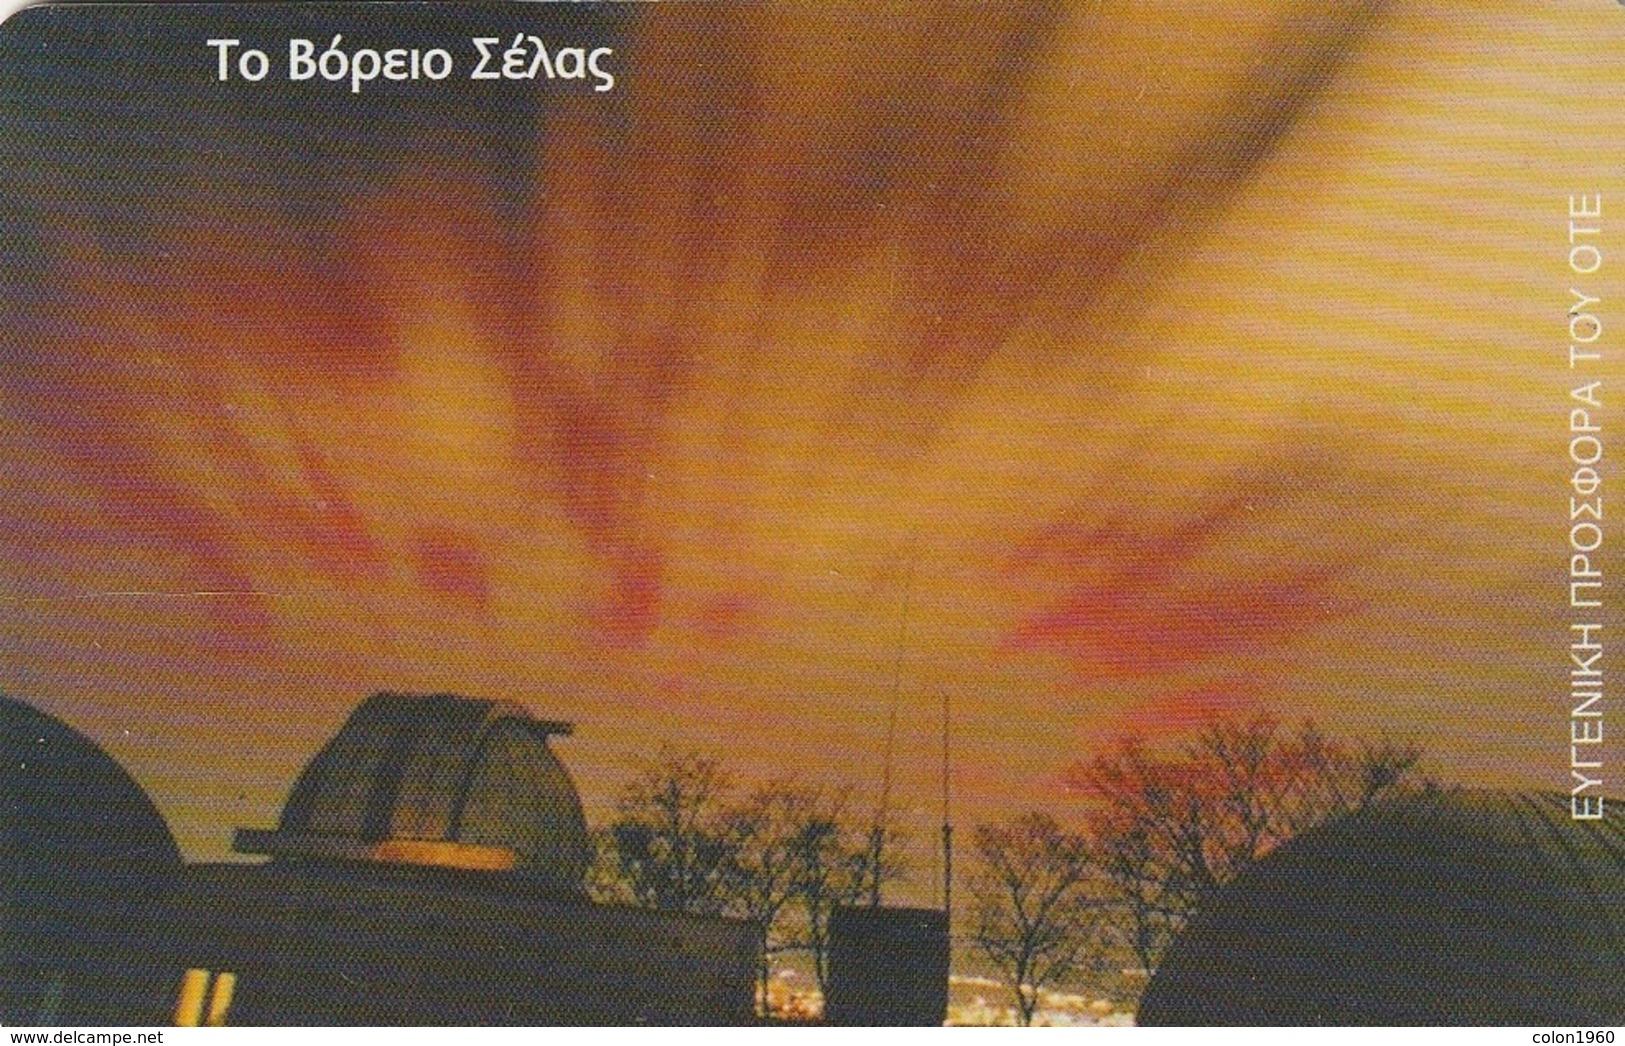 TARJETA TELEFONICA DE GRECIA. Planetarium And Space. Planetarium 1, X1508a (033) - Espacio